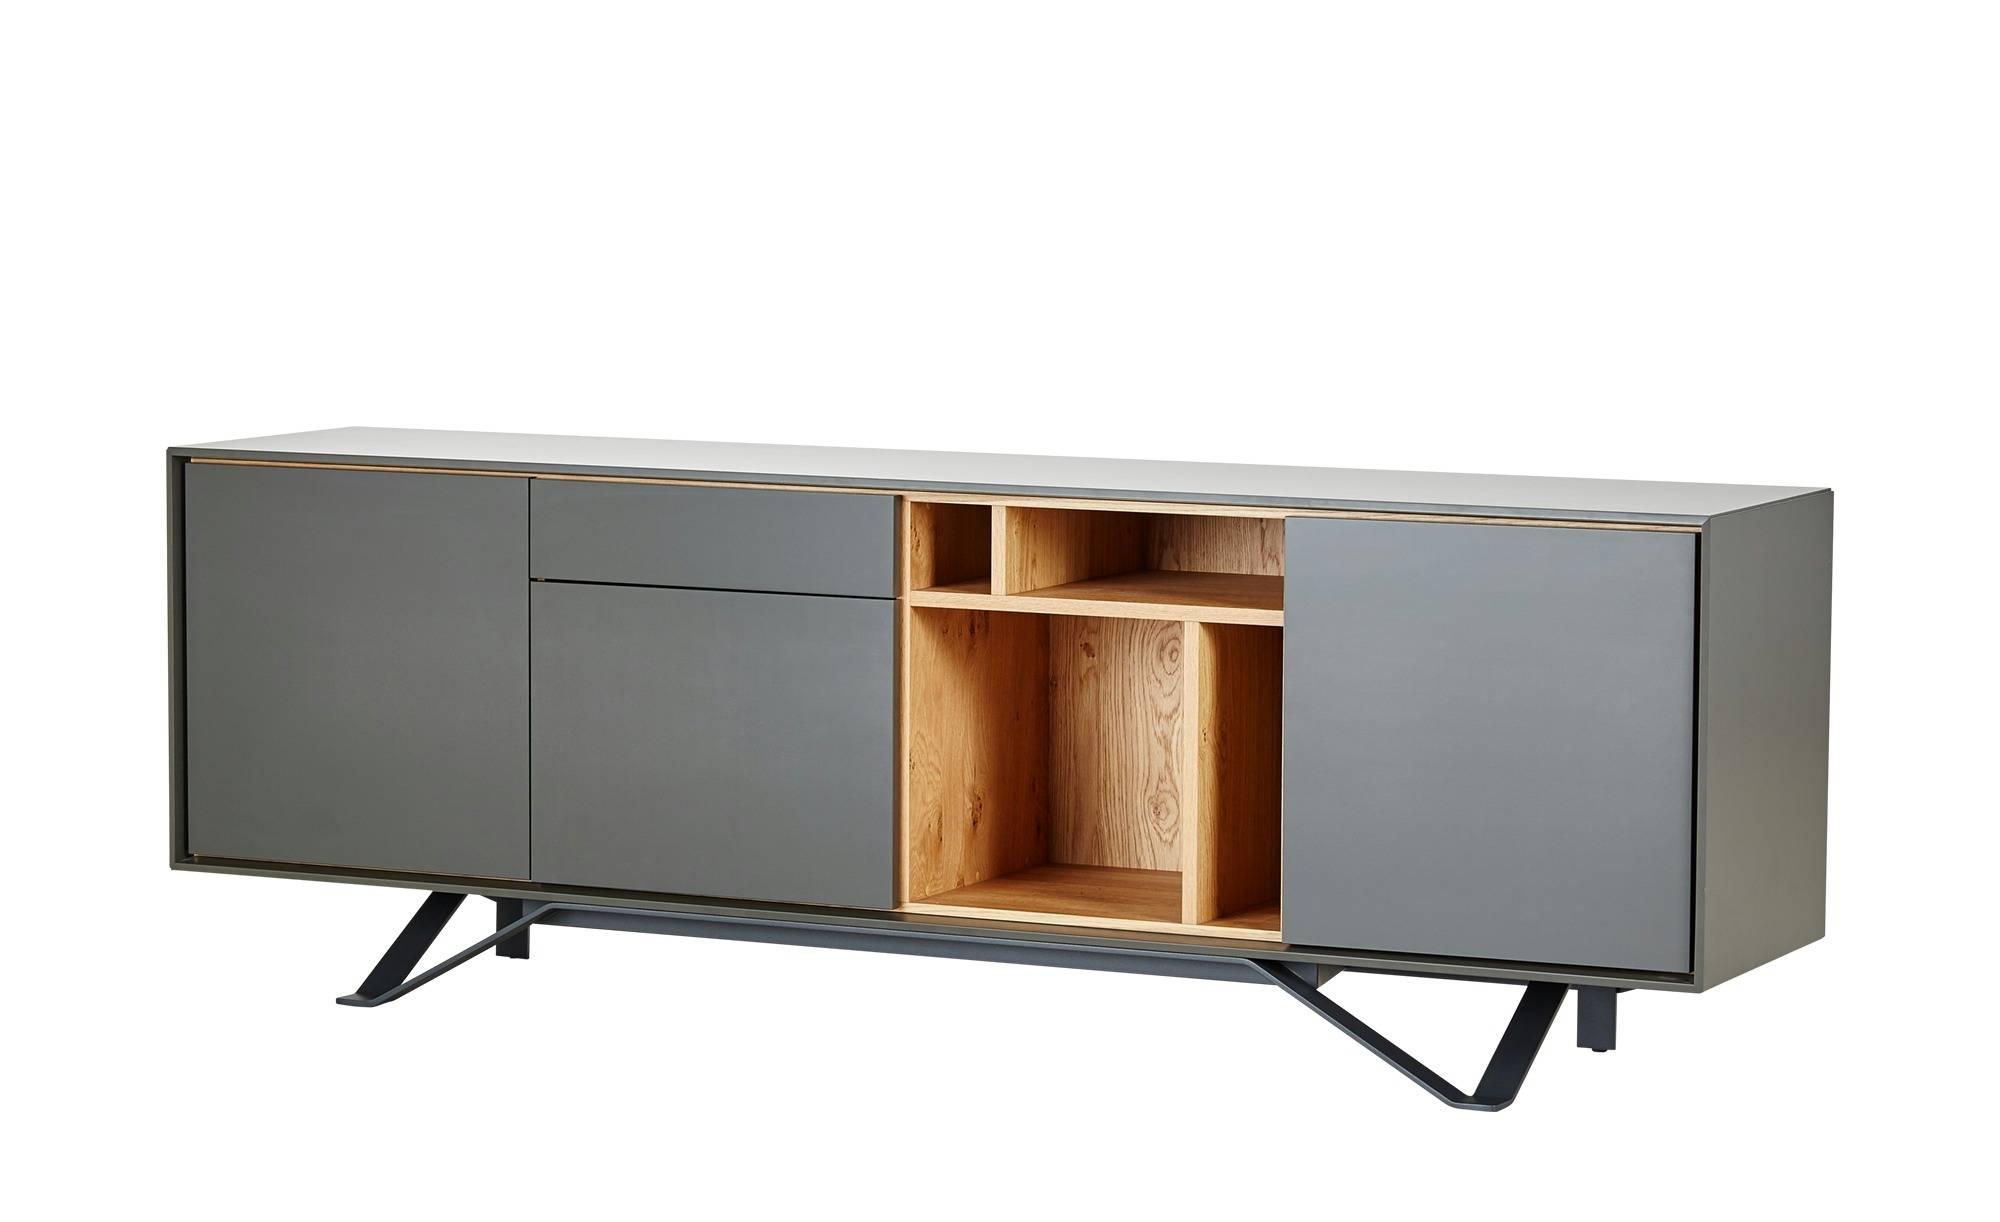 Hülsta Sideboard Scopia | Möbel Höffner pertaining to Hulsta Sideboards (Image 11 of 15)